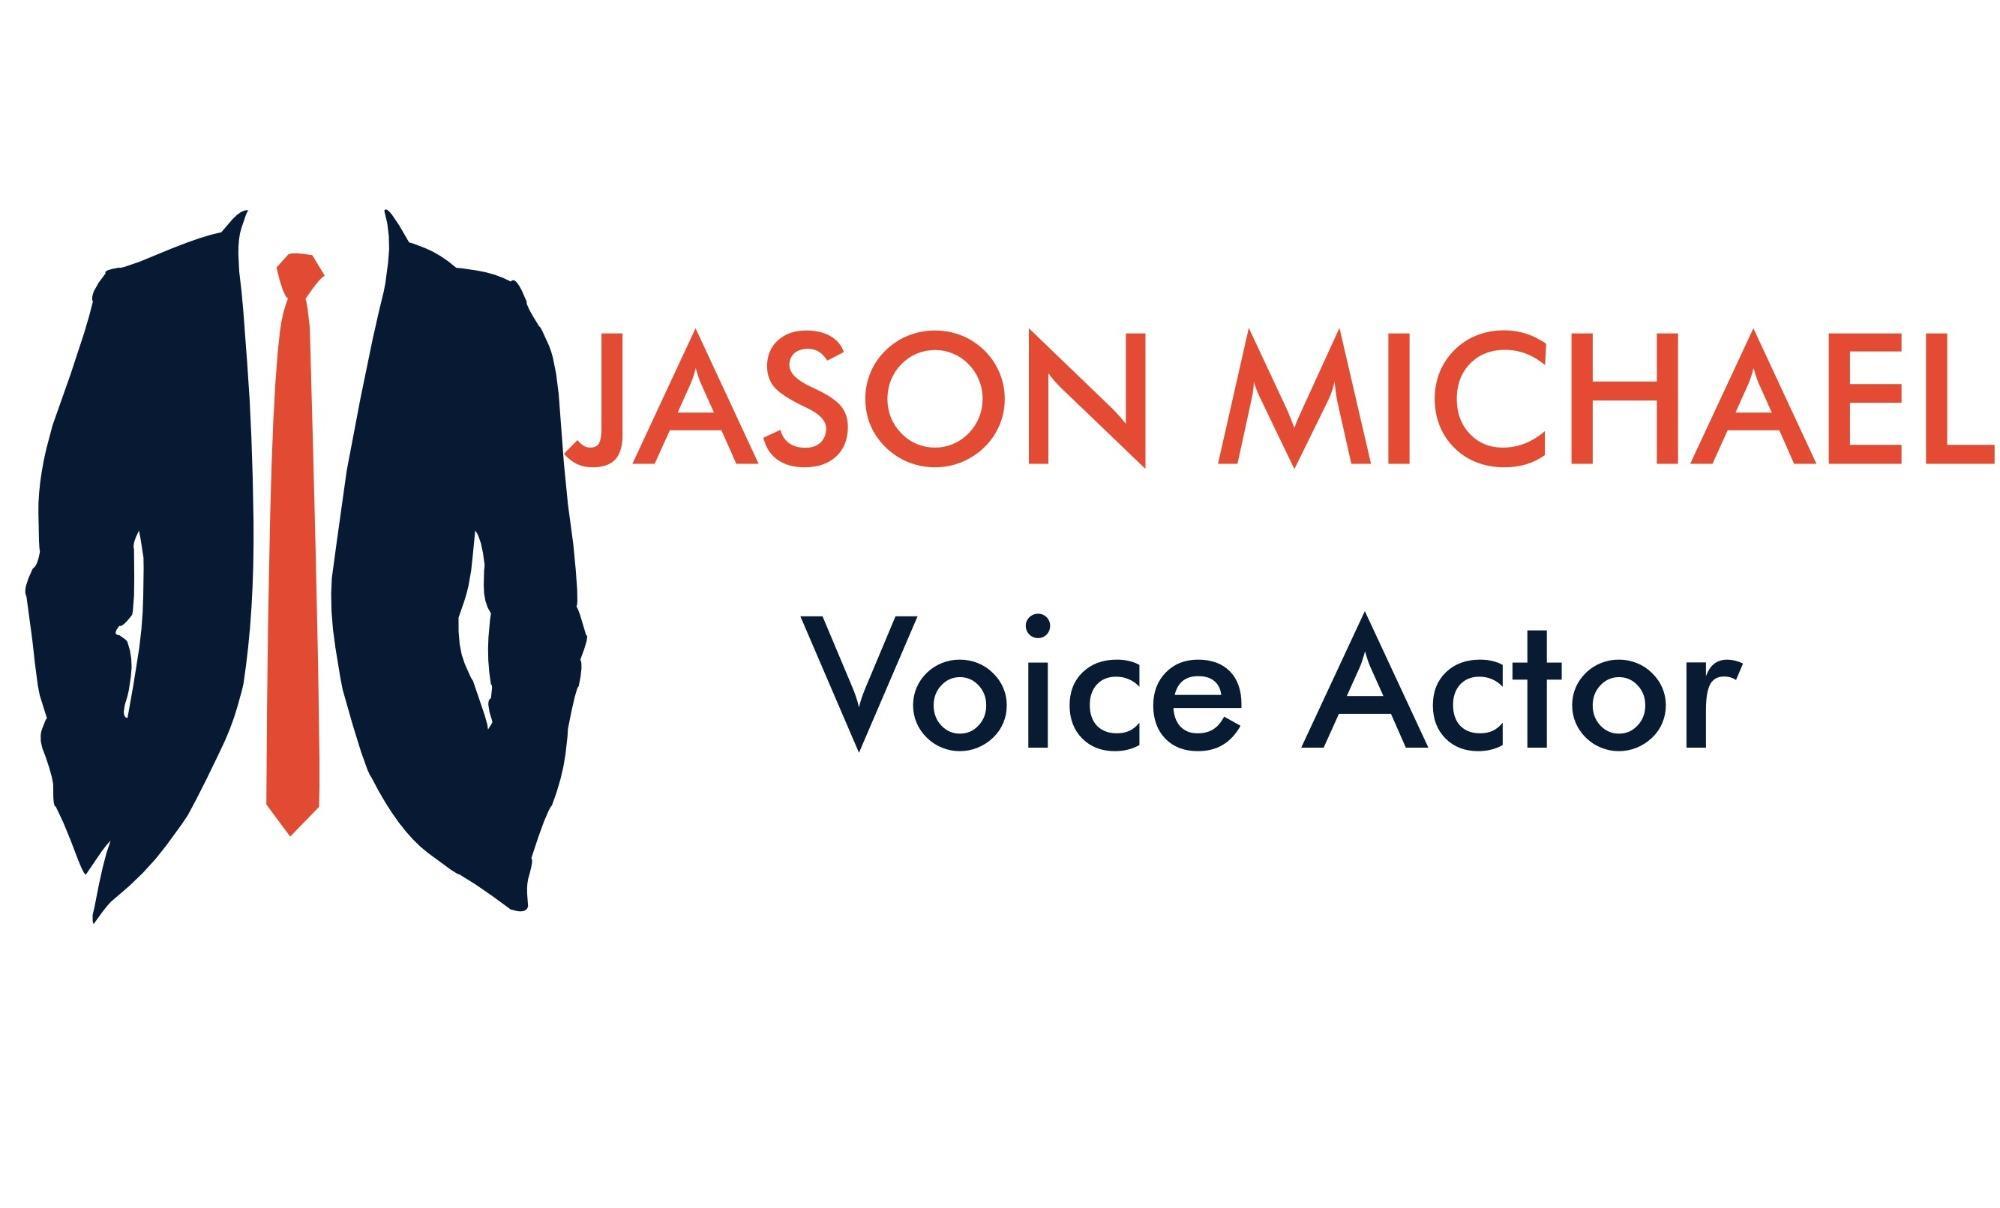 Jason Michael